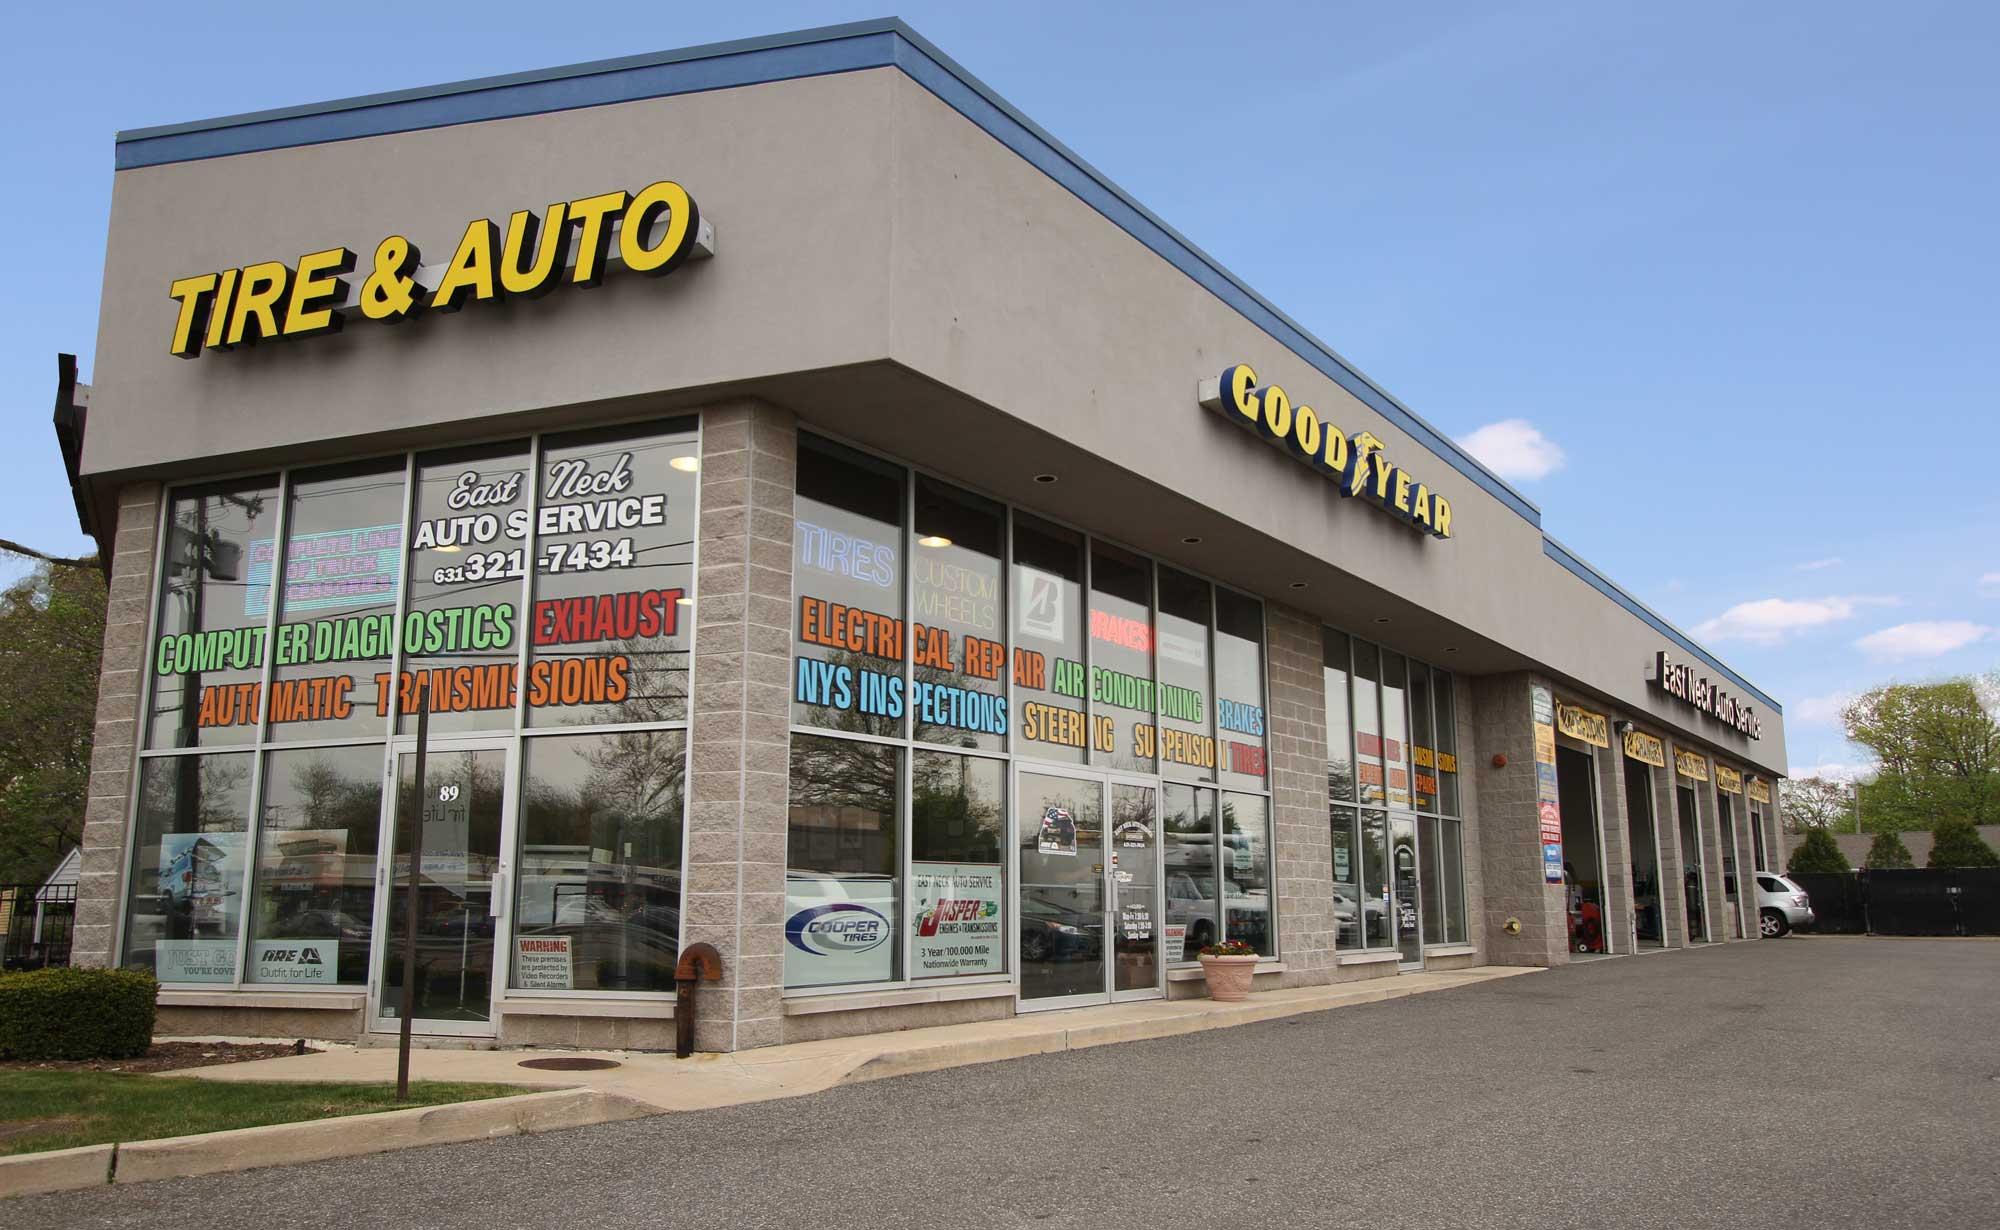 East Neck Auto Service, Auto Repair